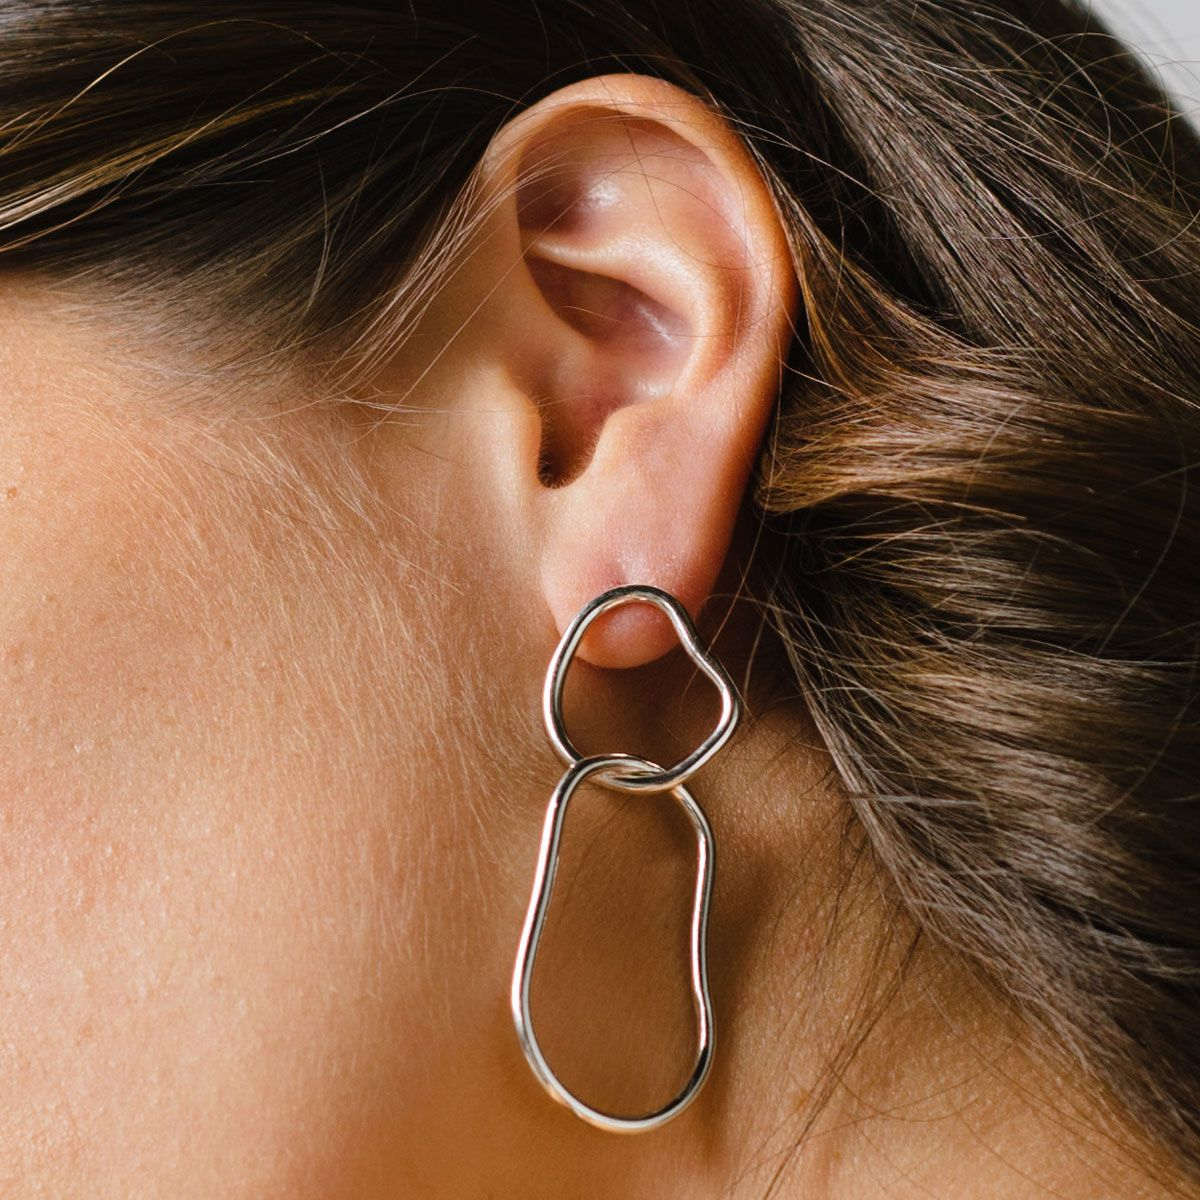 Freeform - Ohrhänger - Silber